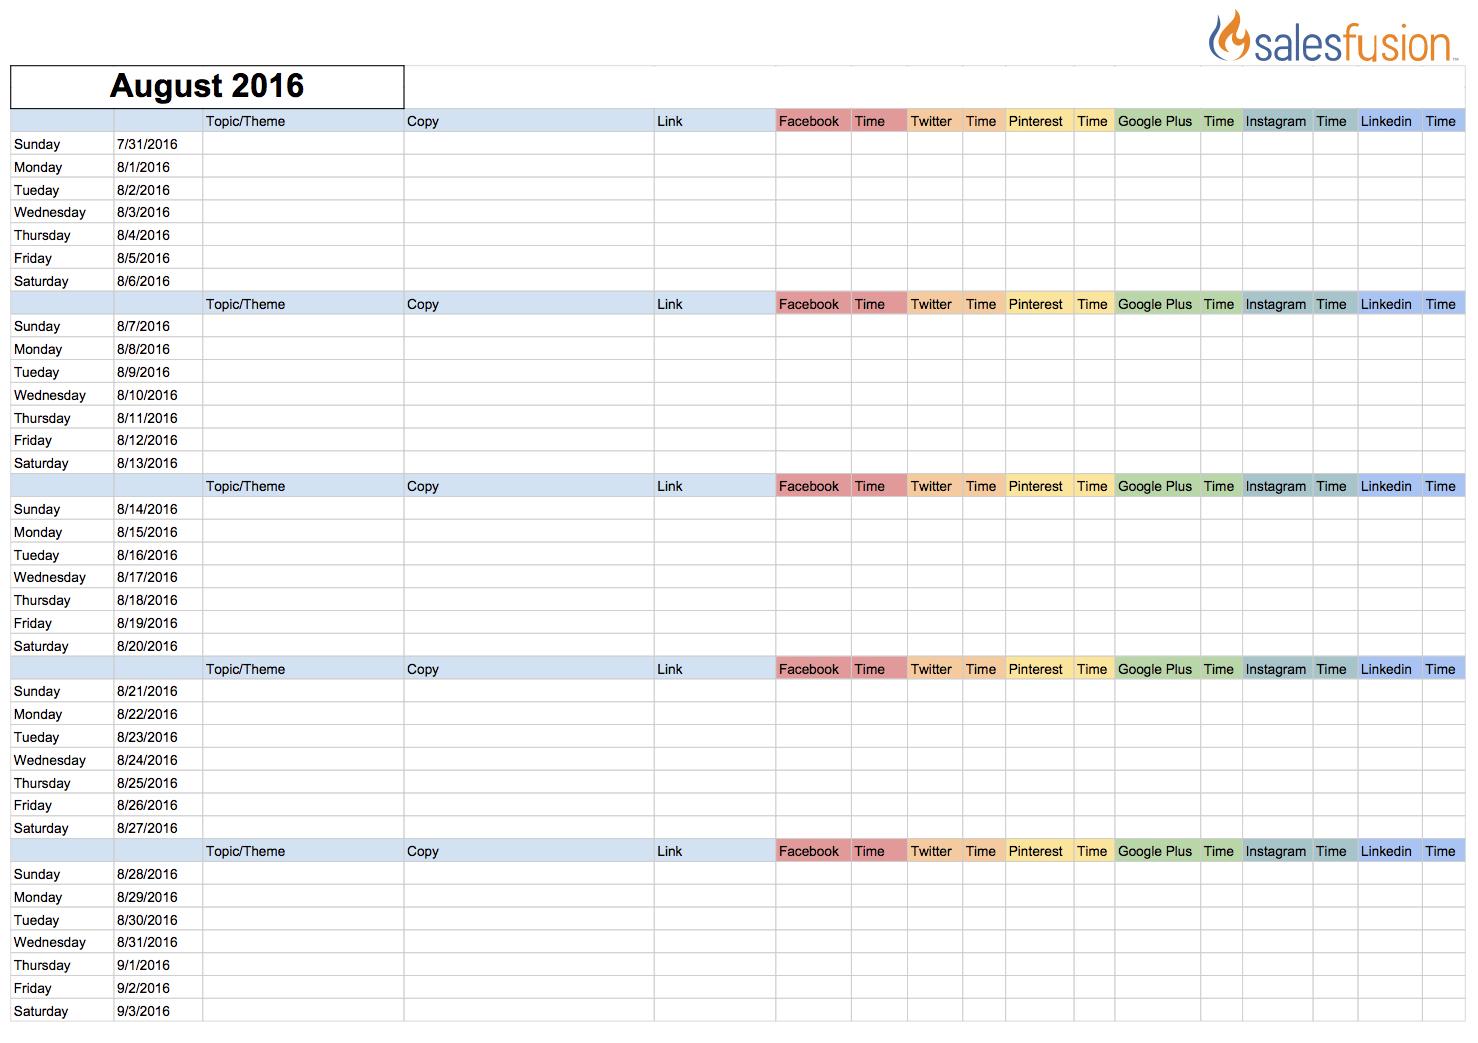 Social Media Content Calendar Template | Salesfusion with Social Media Calendar Template